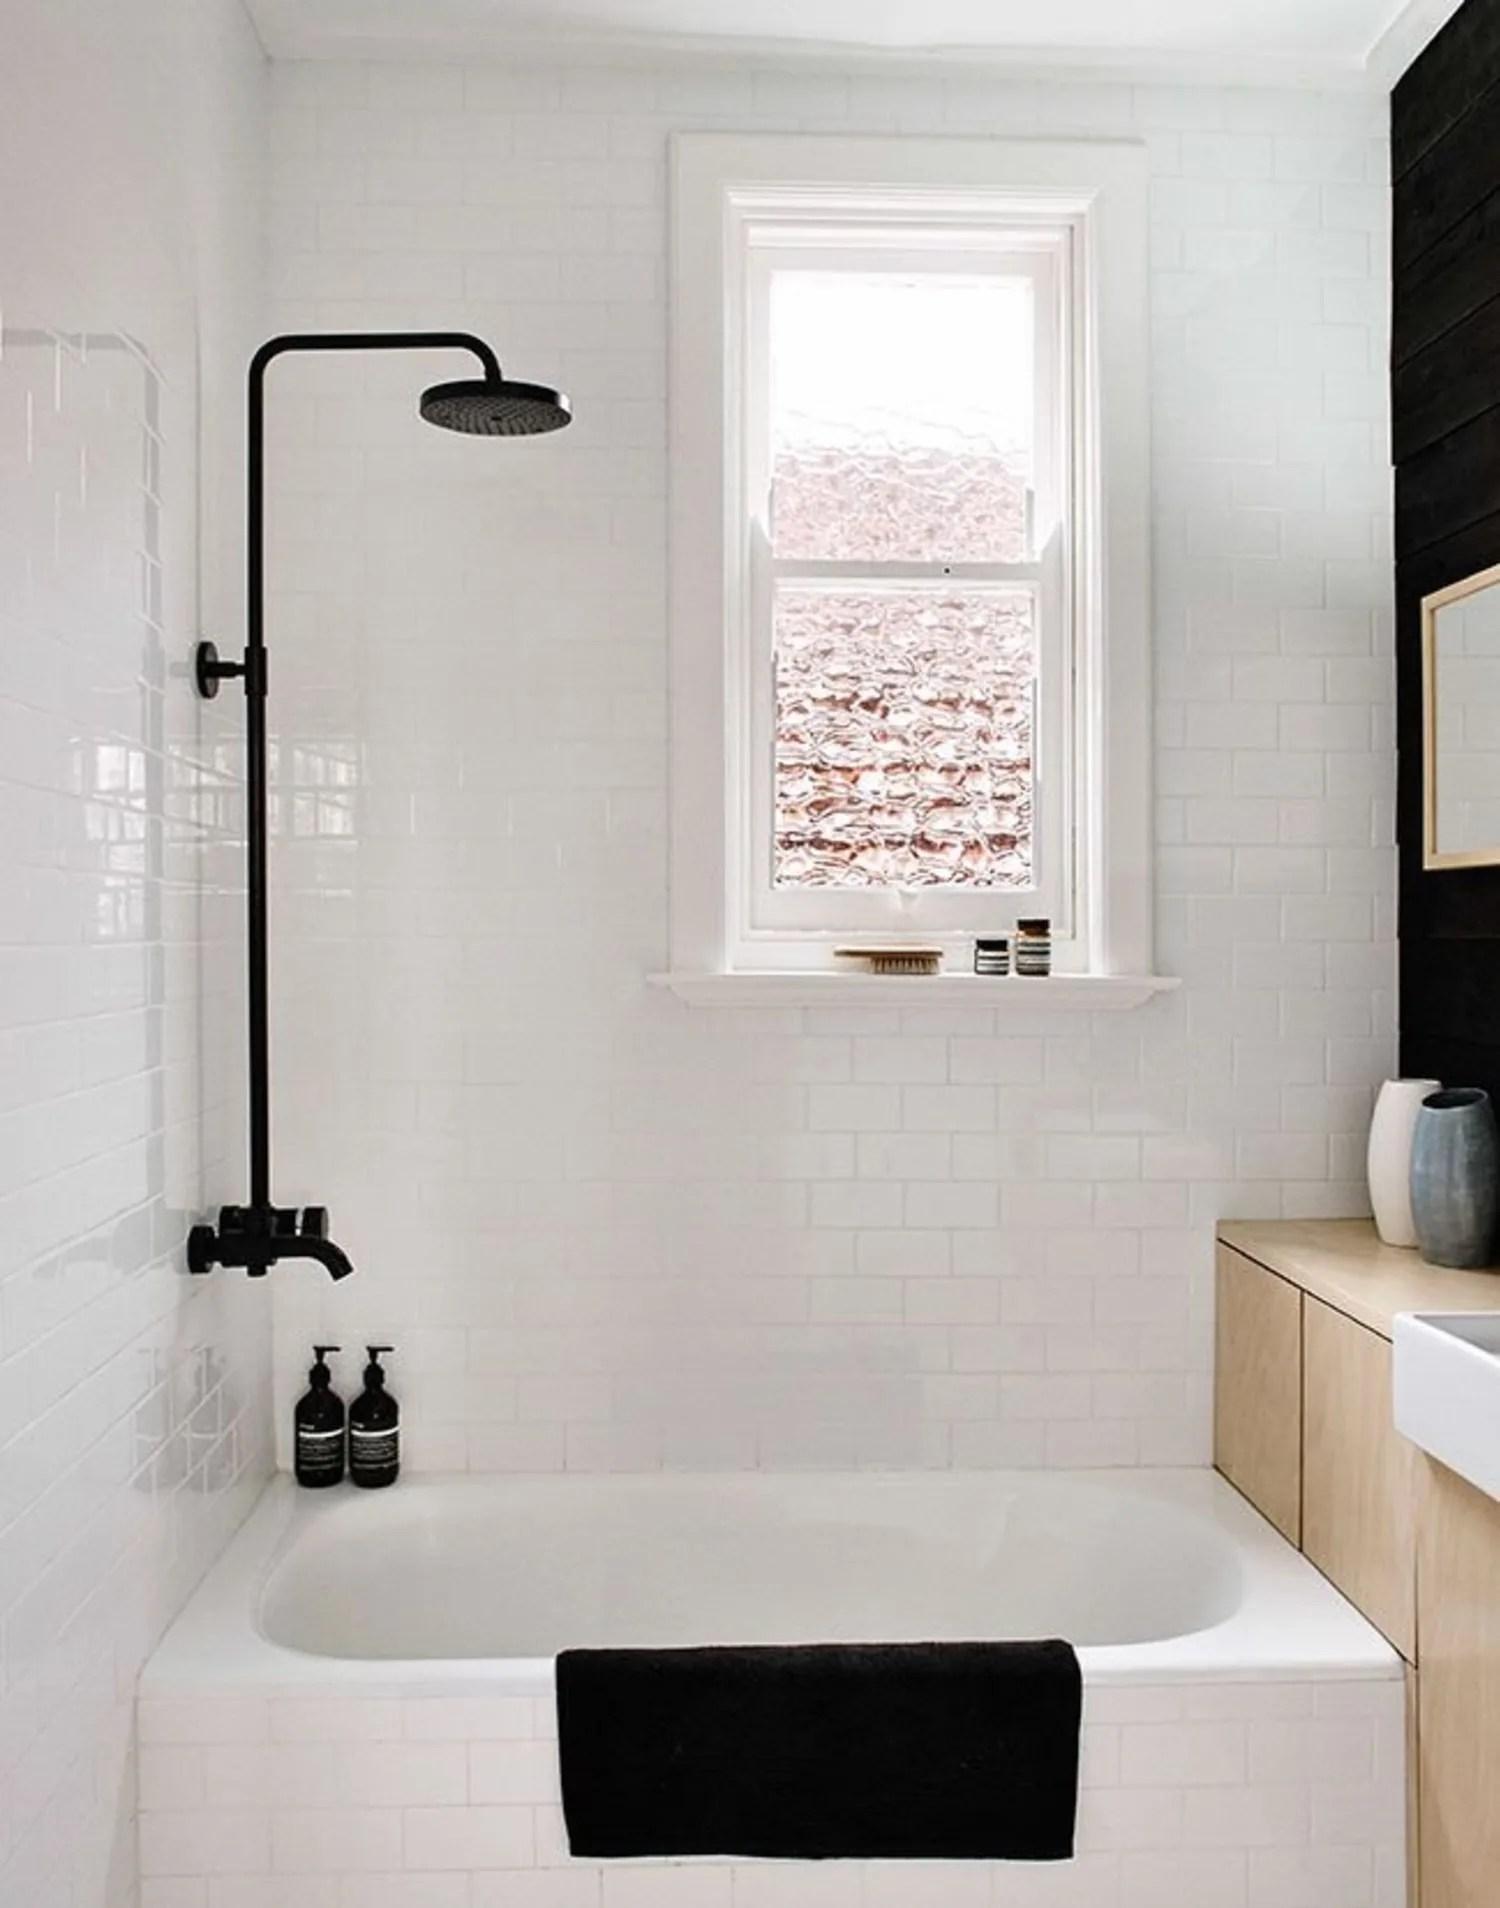 7 Small Bathroom Remodel Ideas - Renovation Pictures of ... on Small Bathroom Renovations  id=69947